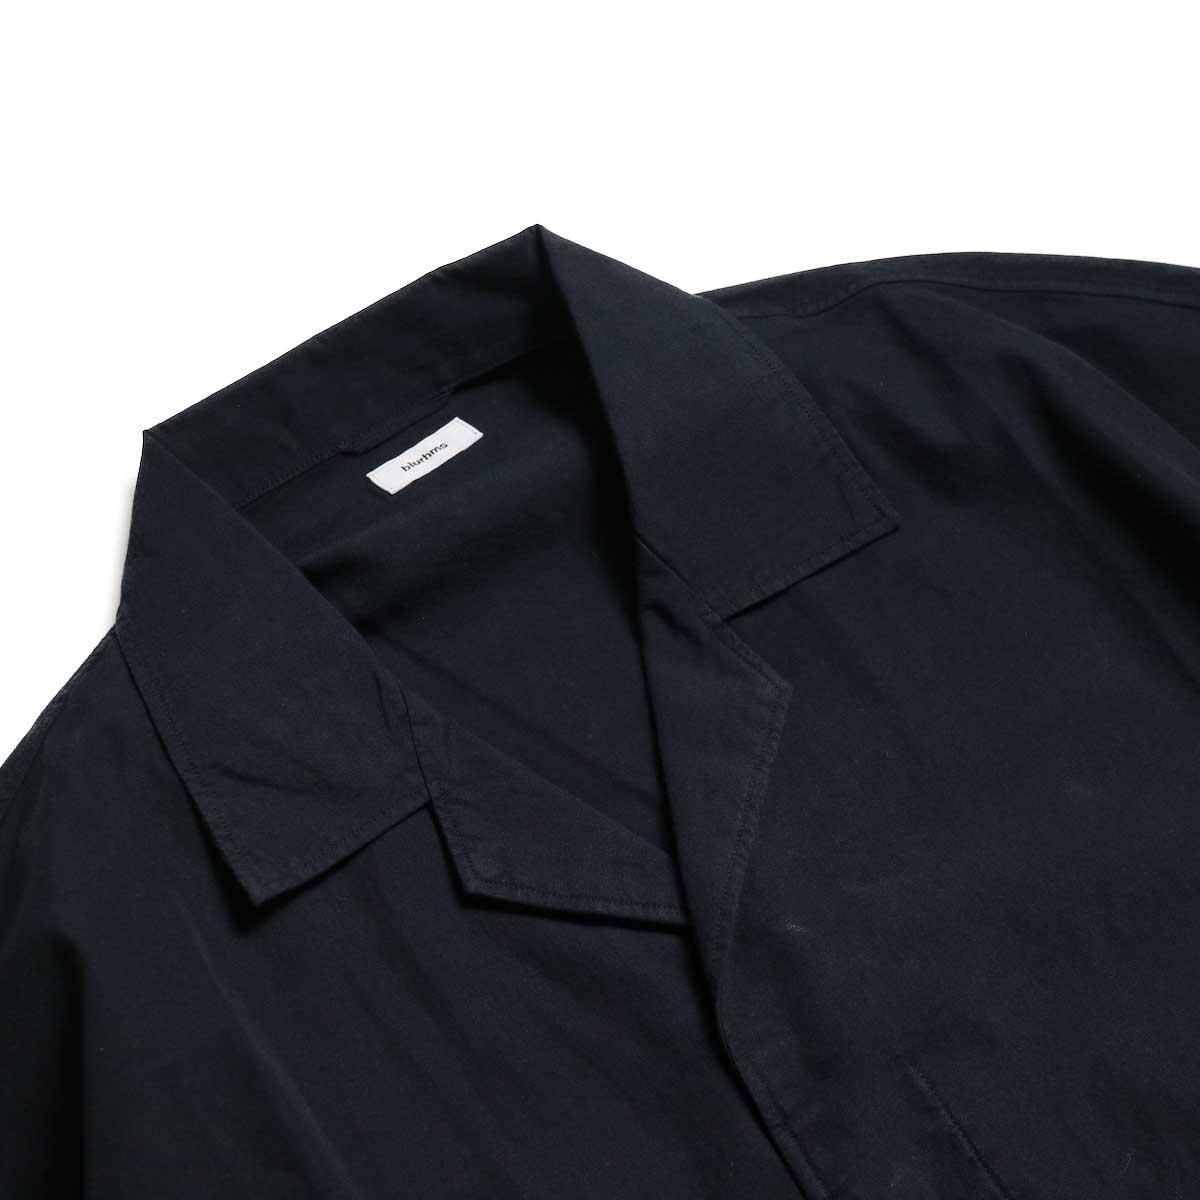 blurhms / Polish Chambray Wide Sleeve Box Shirt -Navy オープンカラー